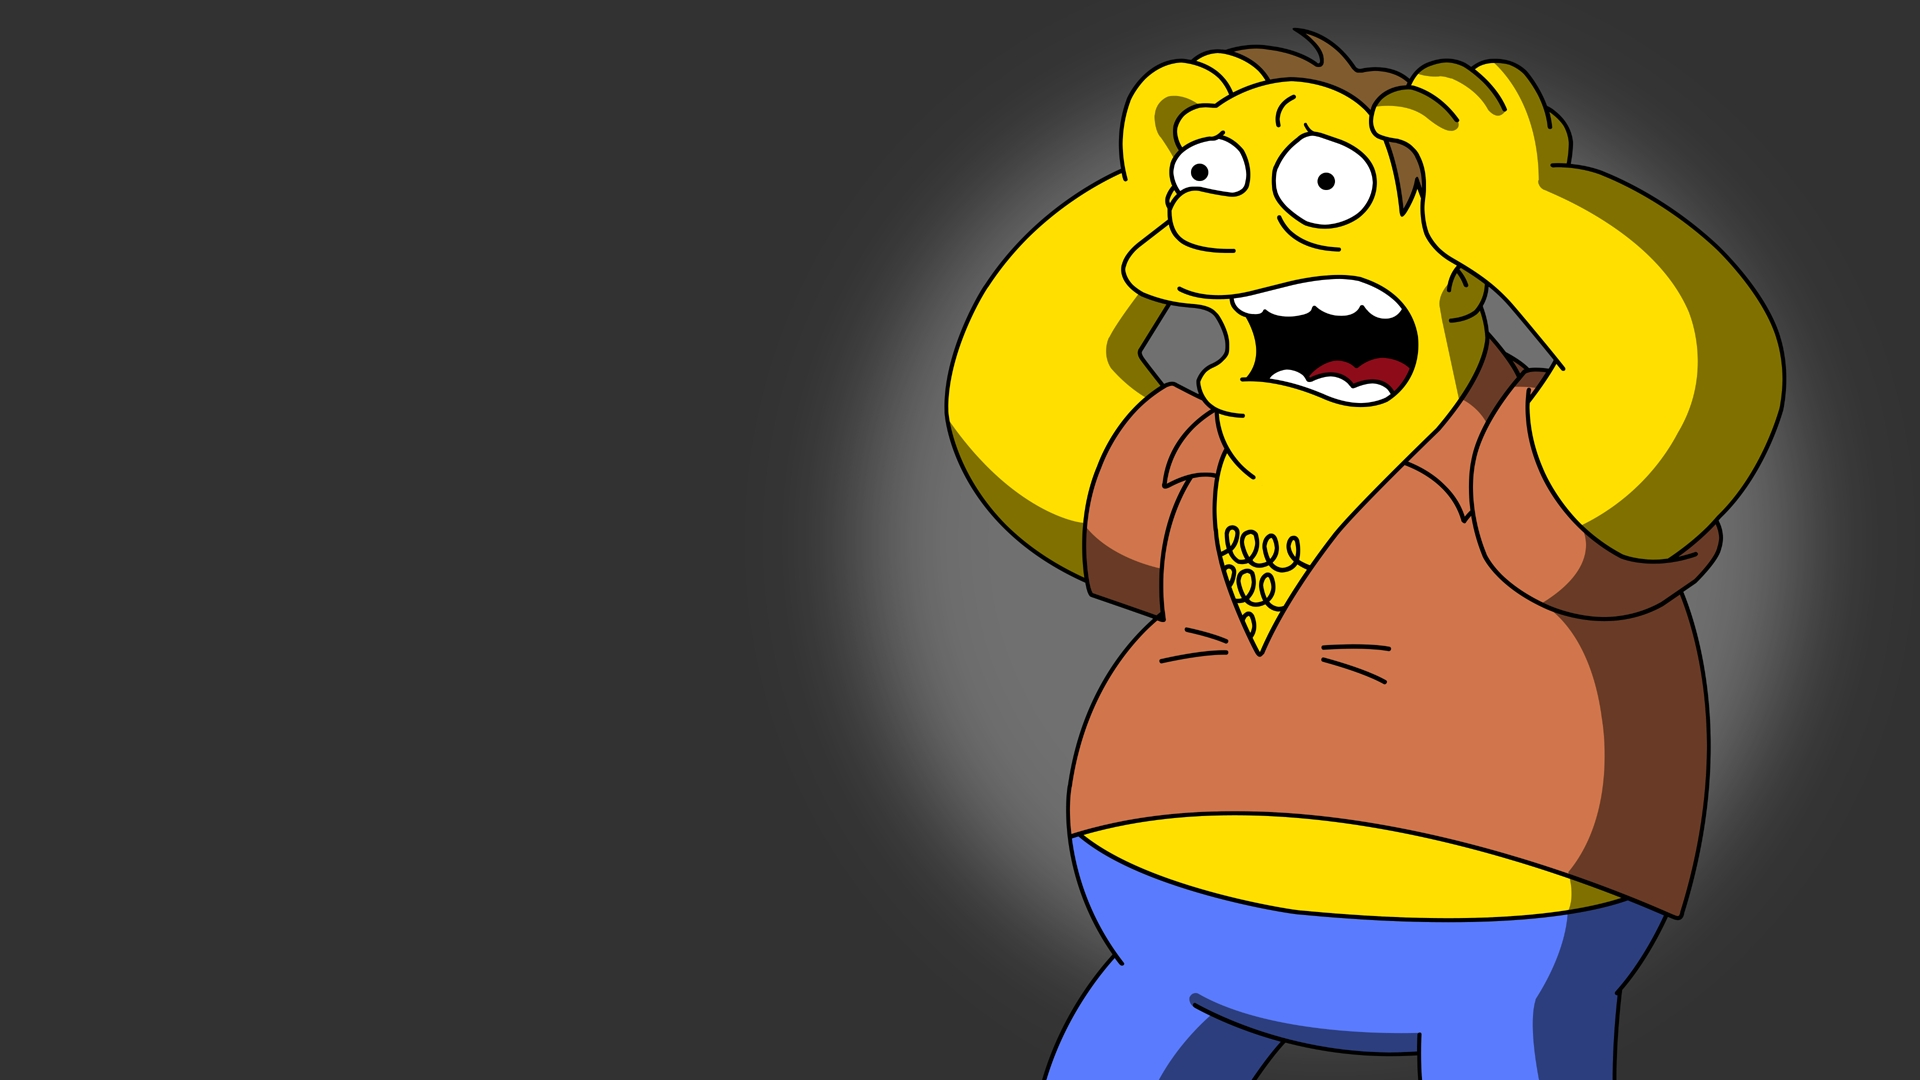 Simpsons Hd